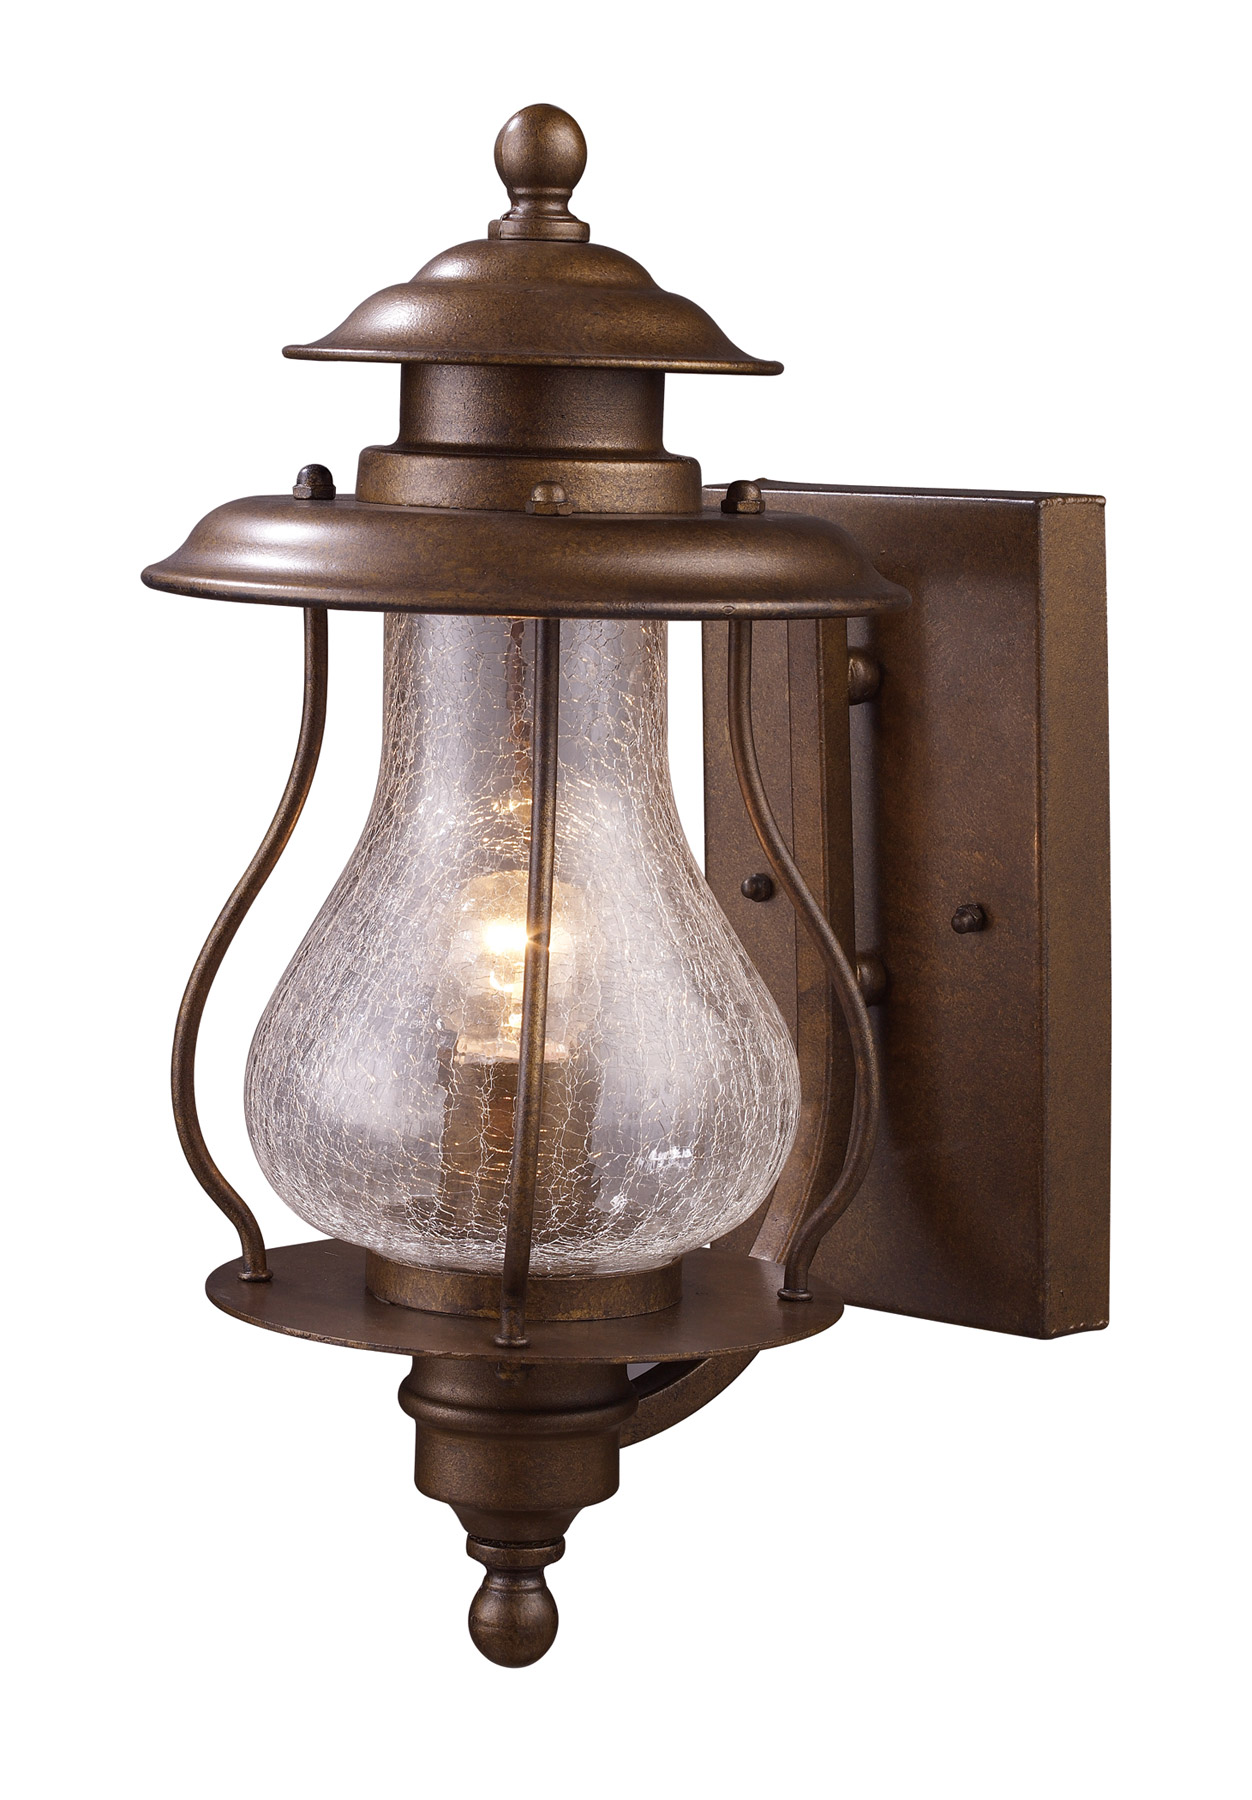 TOP 10 Outdoor wall mounted lights 2019 | Warisan Lighting on Outdoor Wall Sconce Lighting id=52037